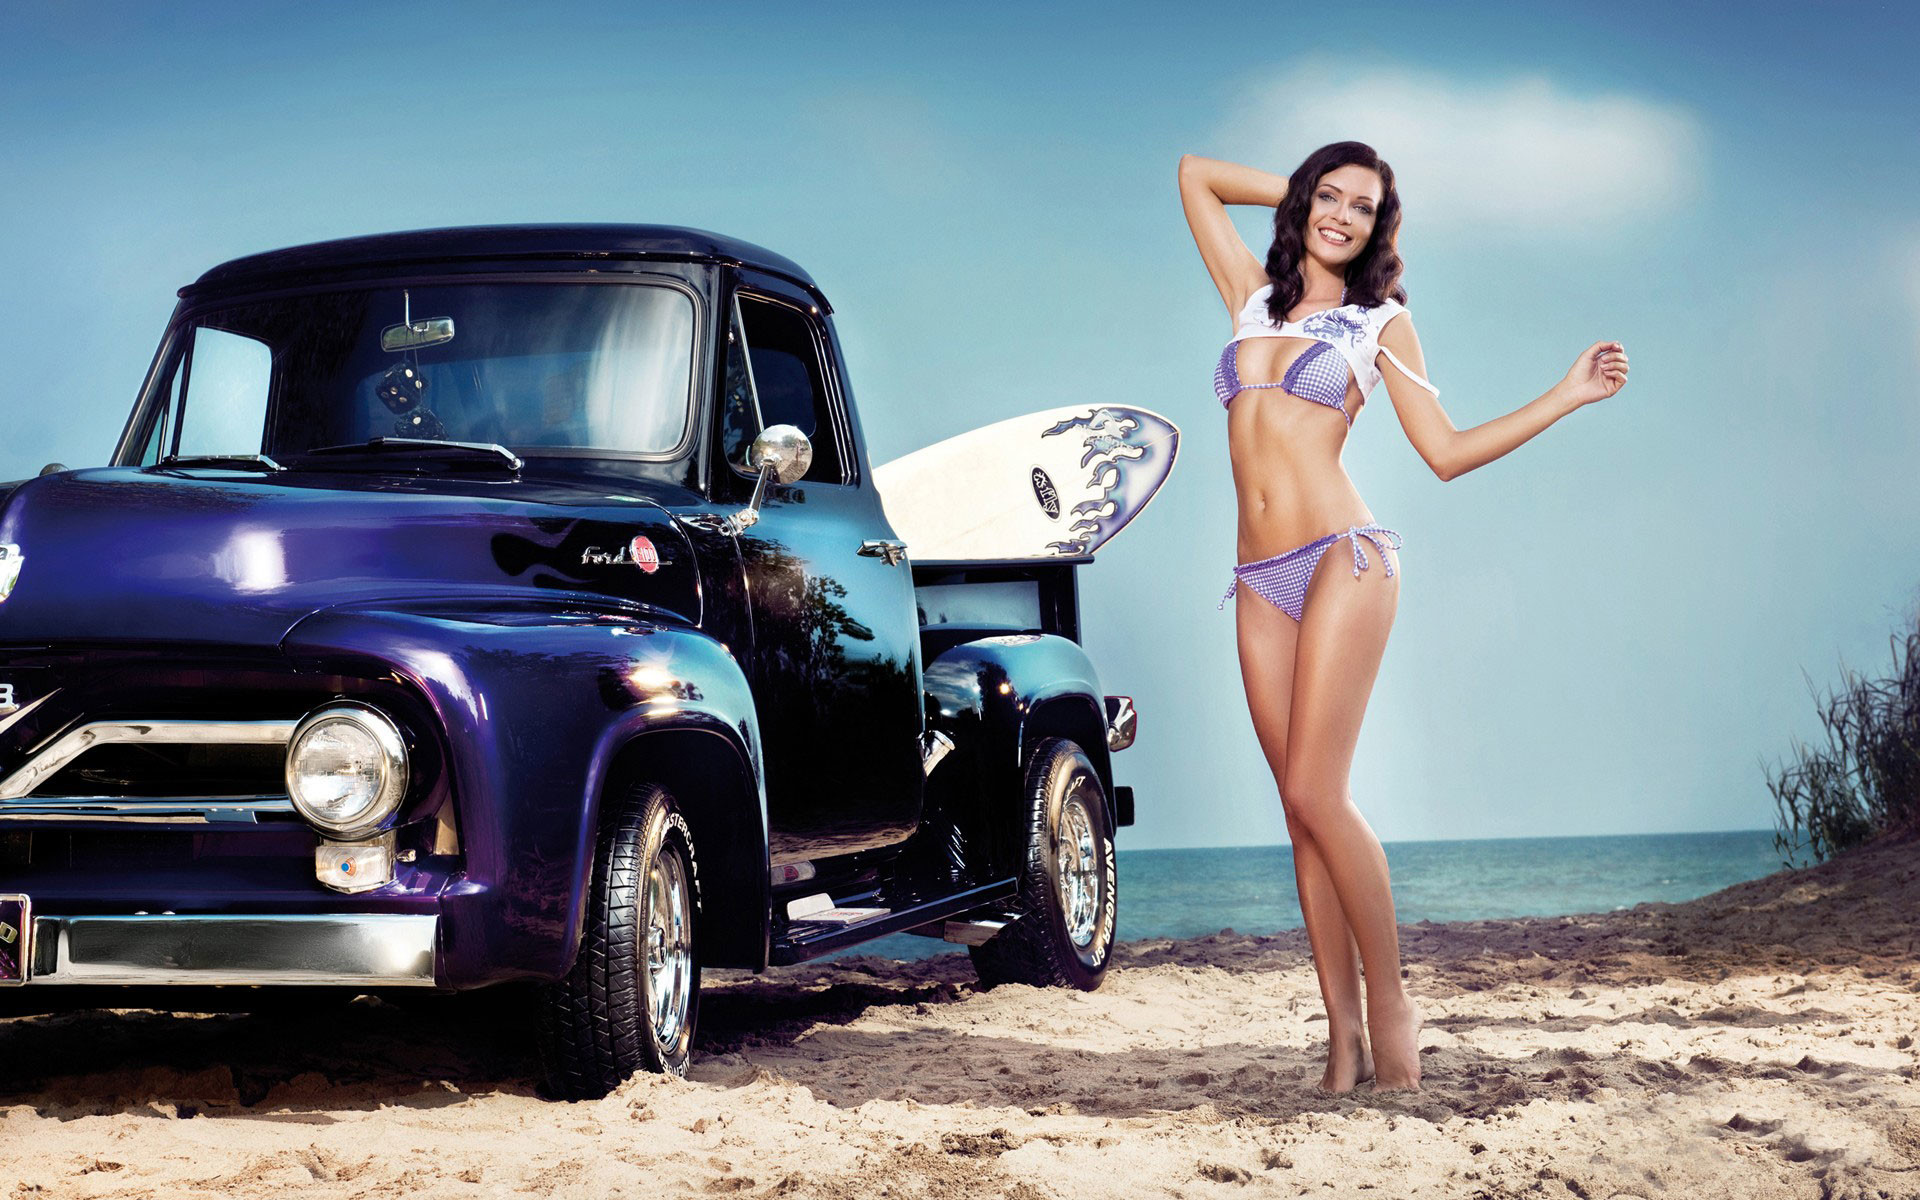 Vehicles girls bikini brunette truck cars wallpaper | | 41780 |  WallpaperUP